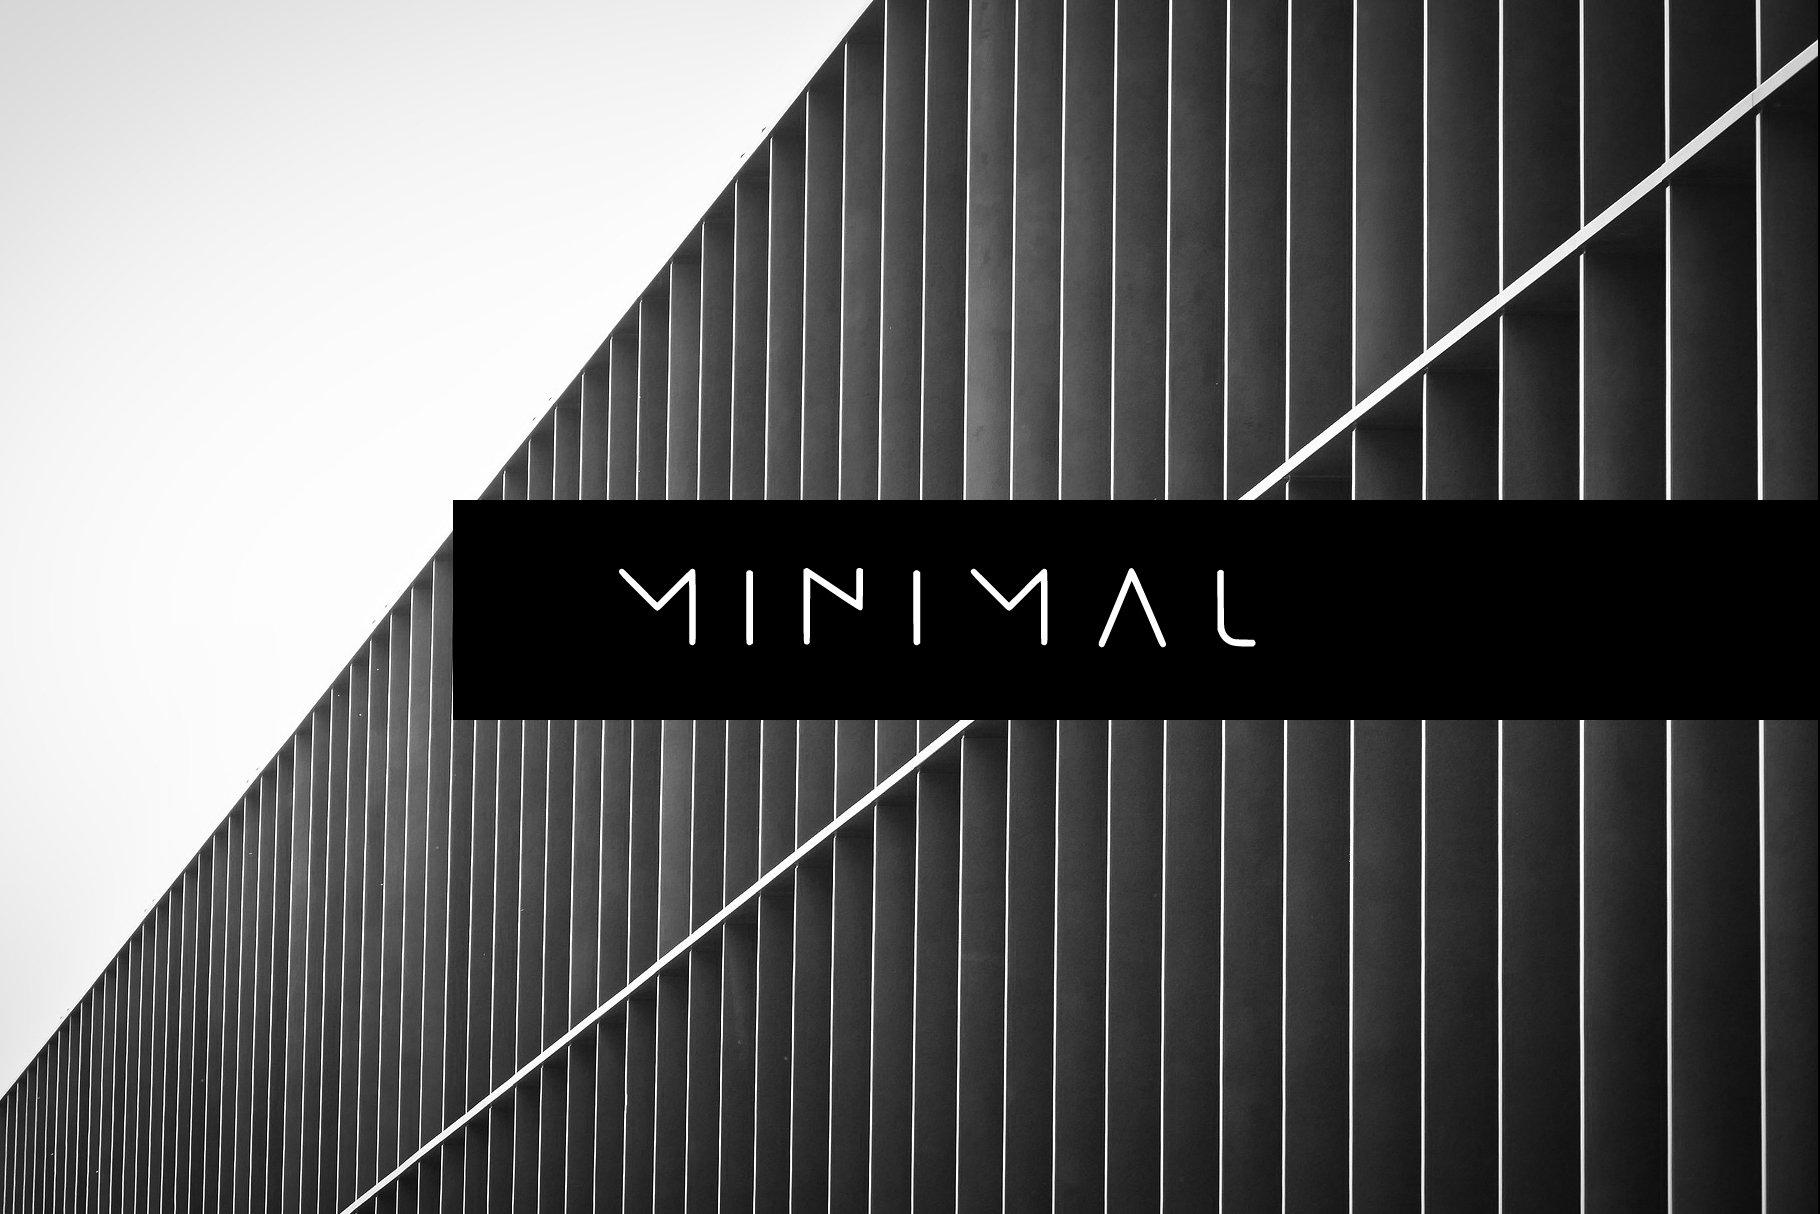 MINIMAL - modern futuristic font example image 1